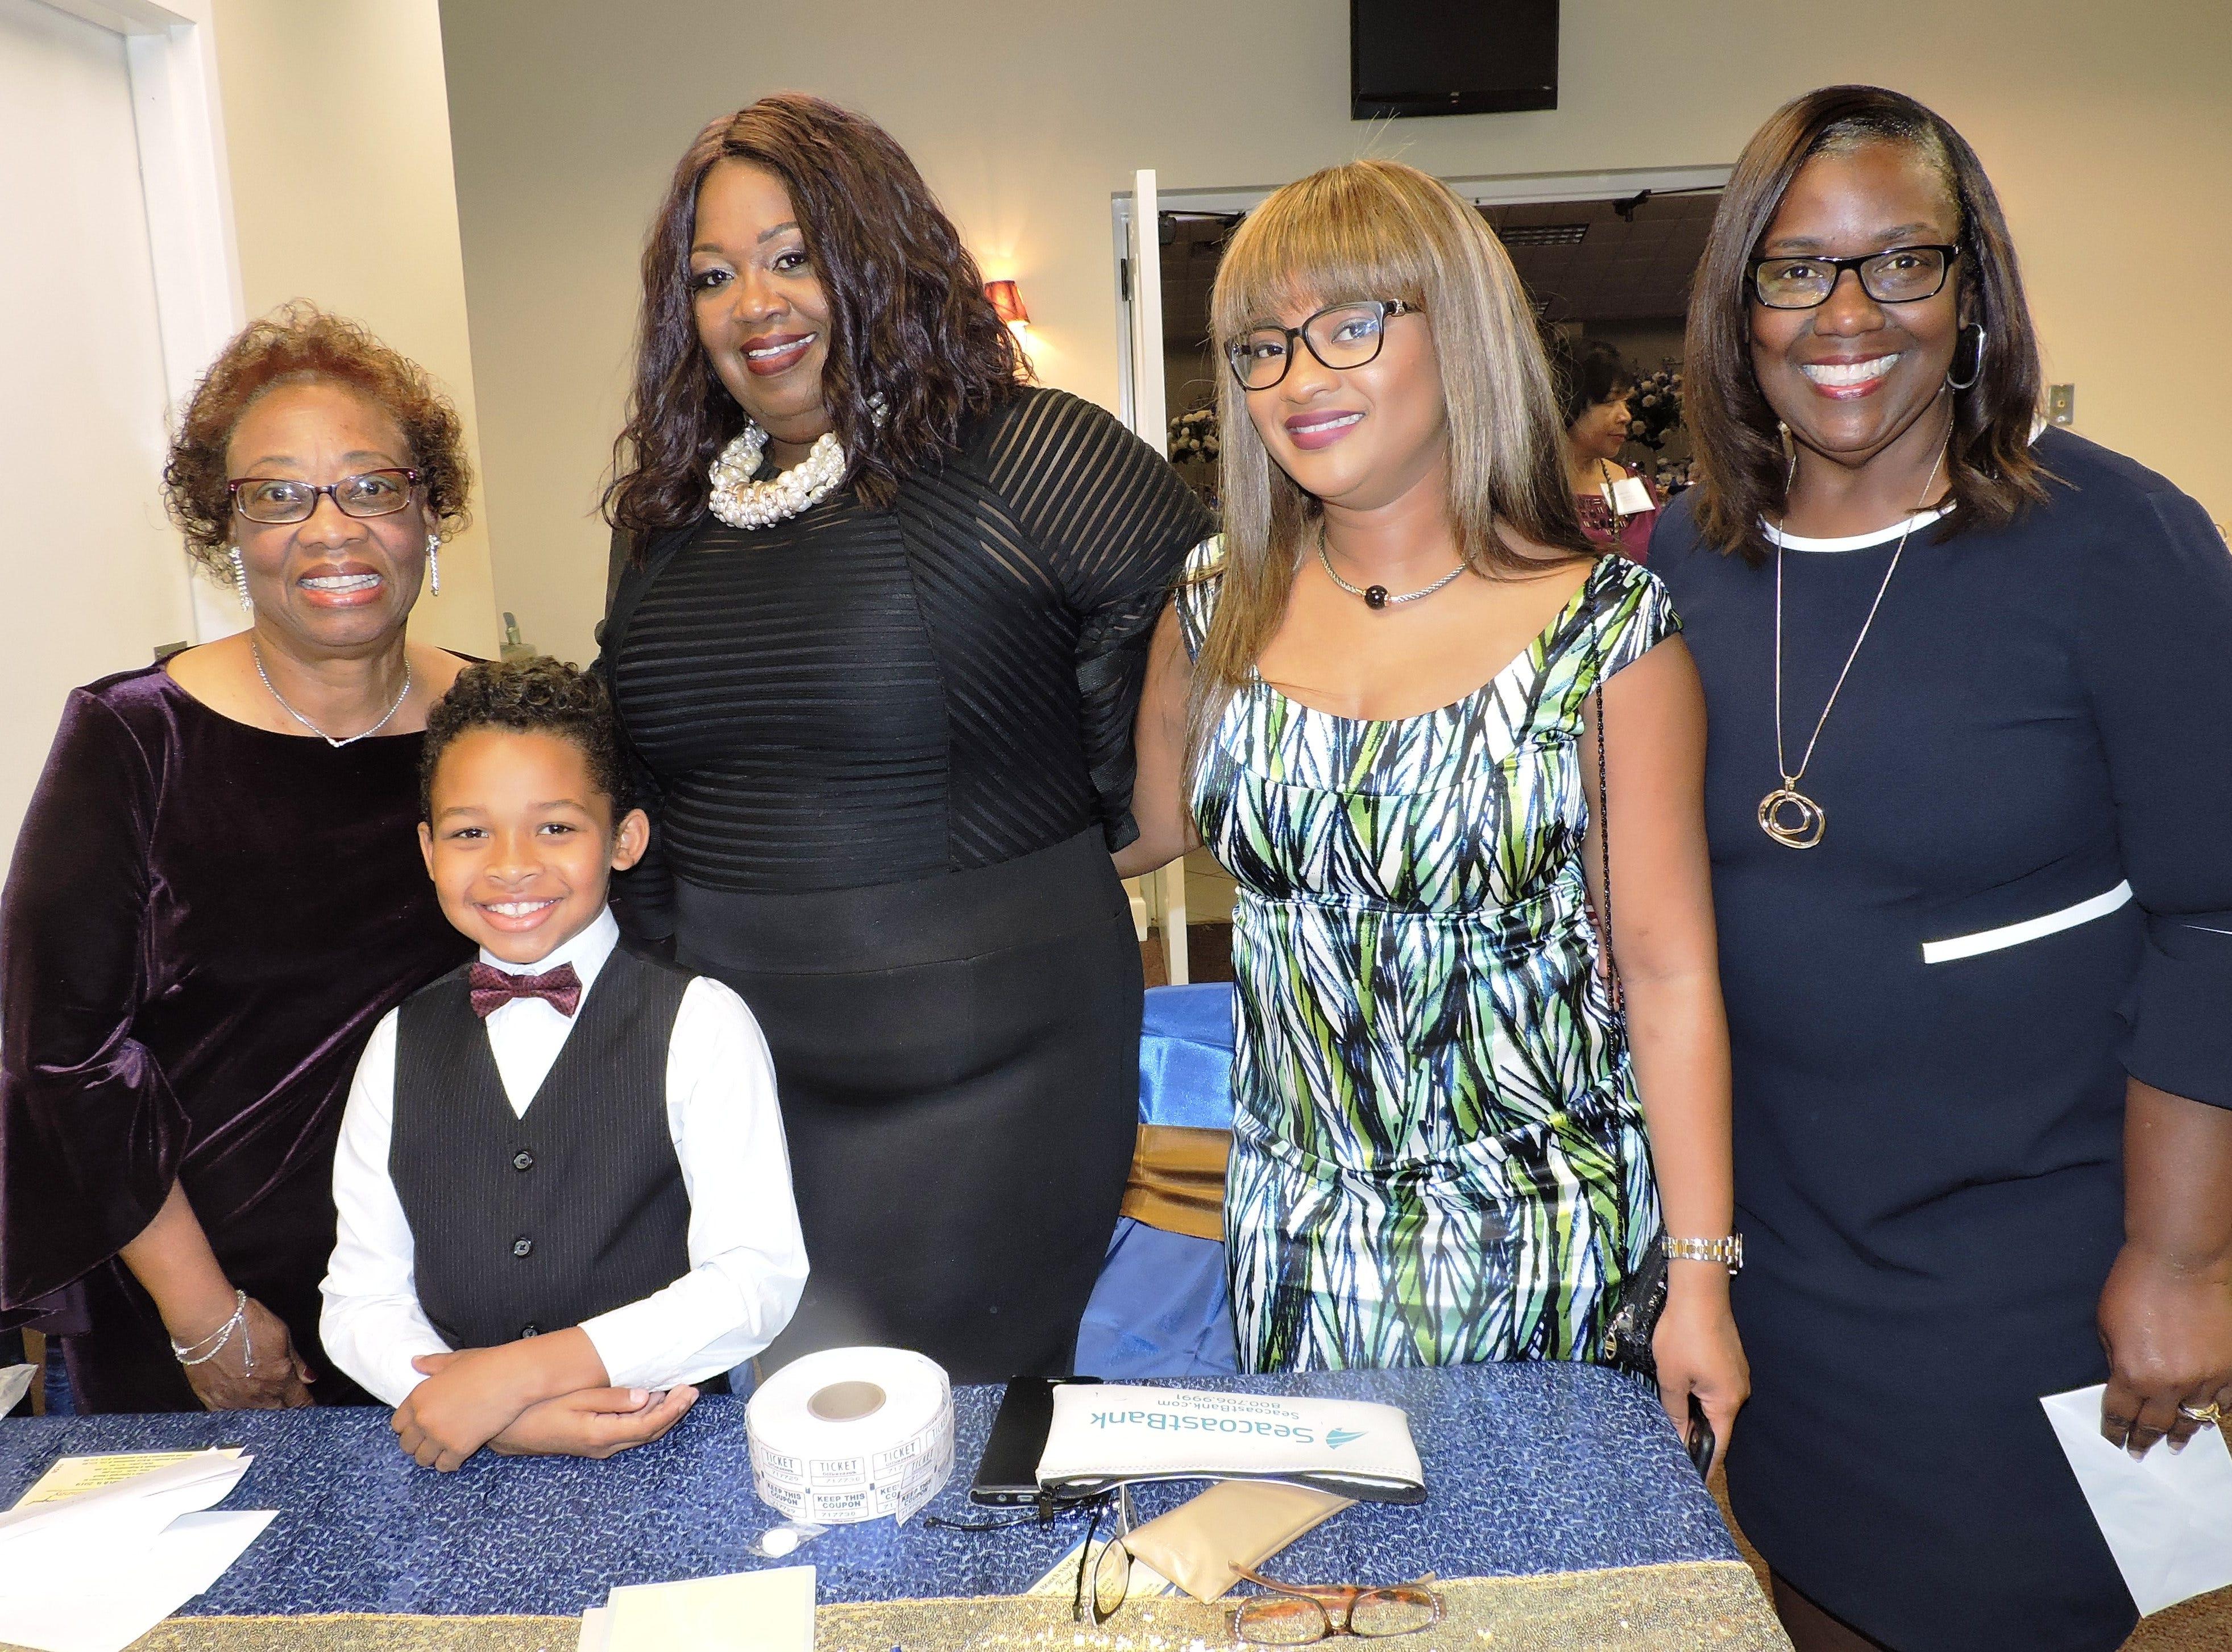 Gladys Clark, left, Lextin Clark, Brenda Matheny, Mia Pintard and Thelma Washington at the 2019 Freedom Fund Banquet.